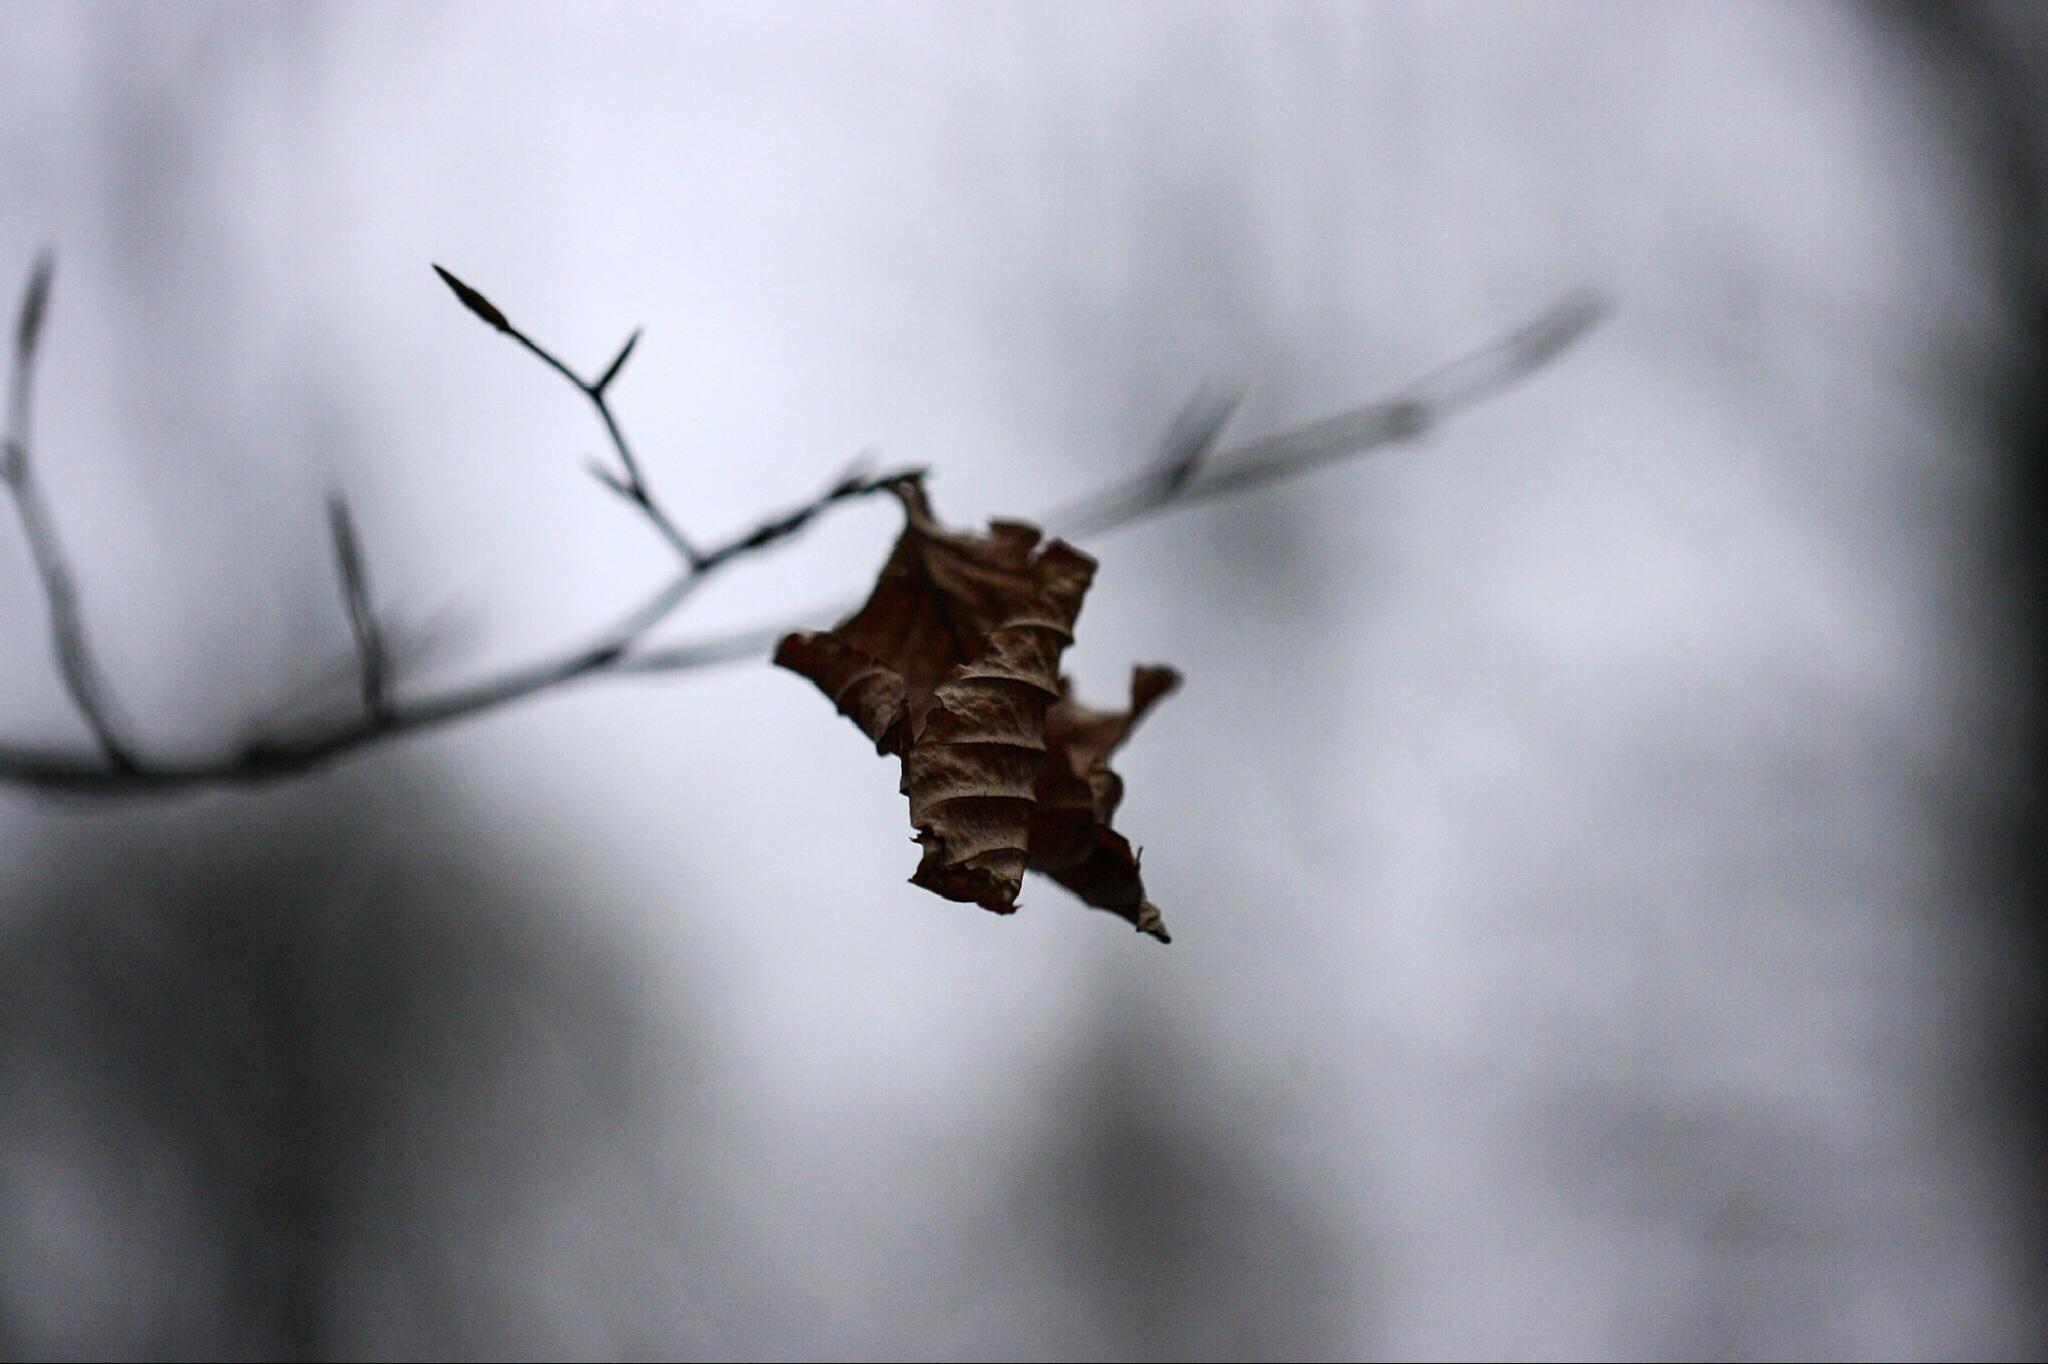 The Last Leaf by Michael Grundy